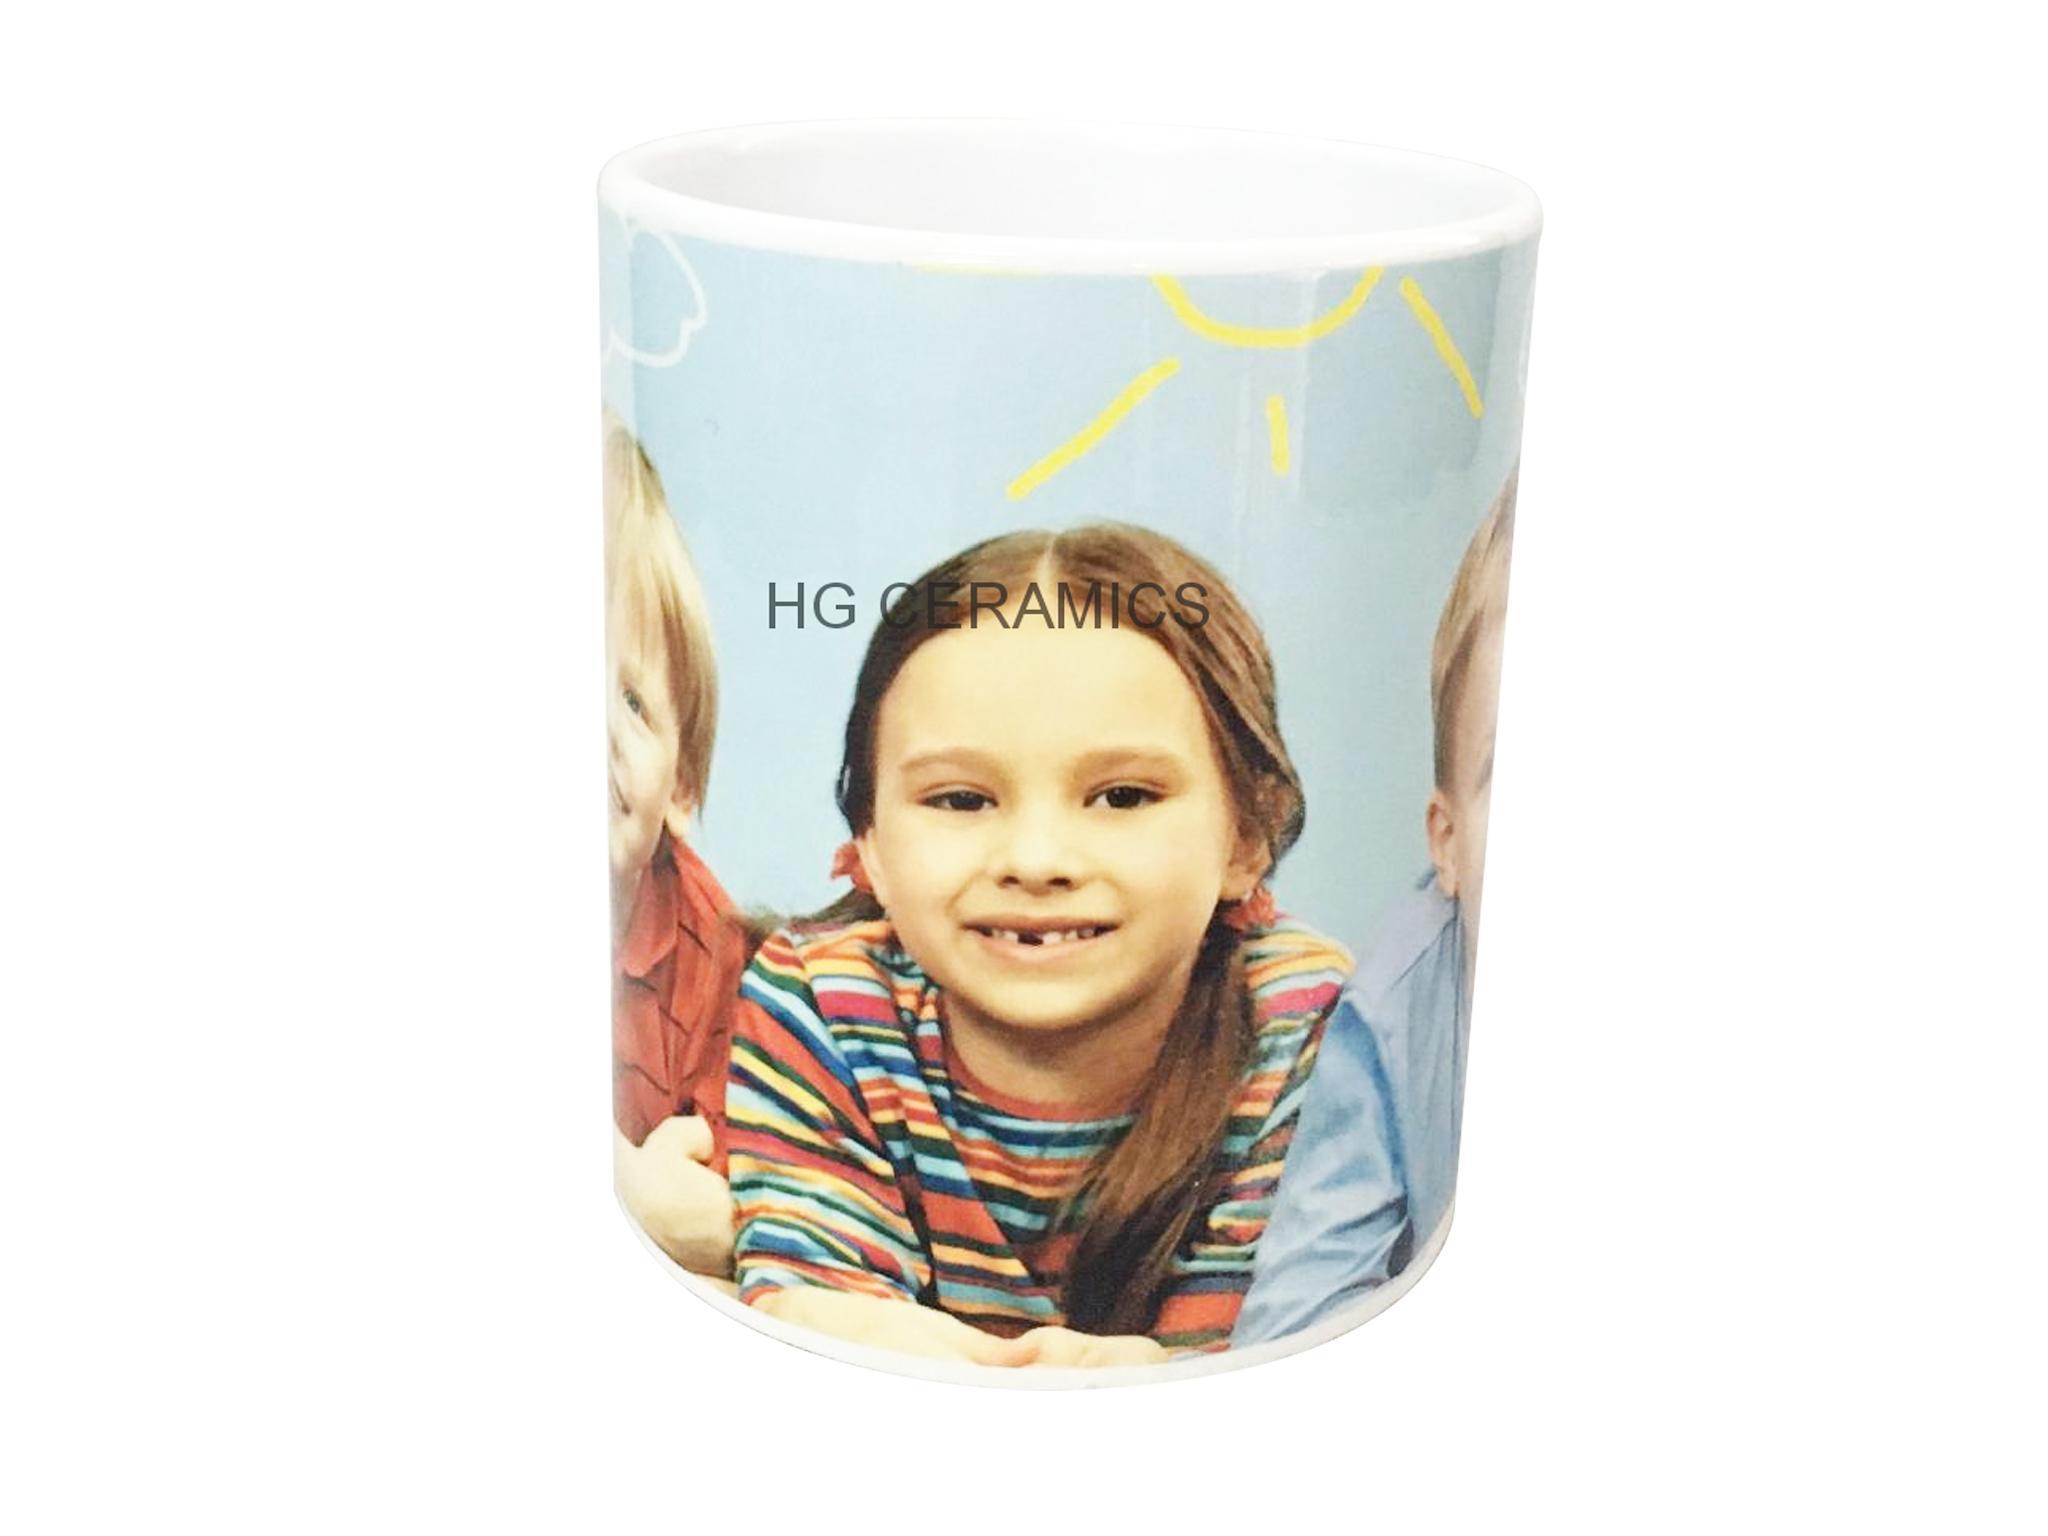 11oz Sublimation white mug with gold /si  er handle  3